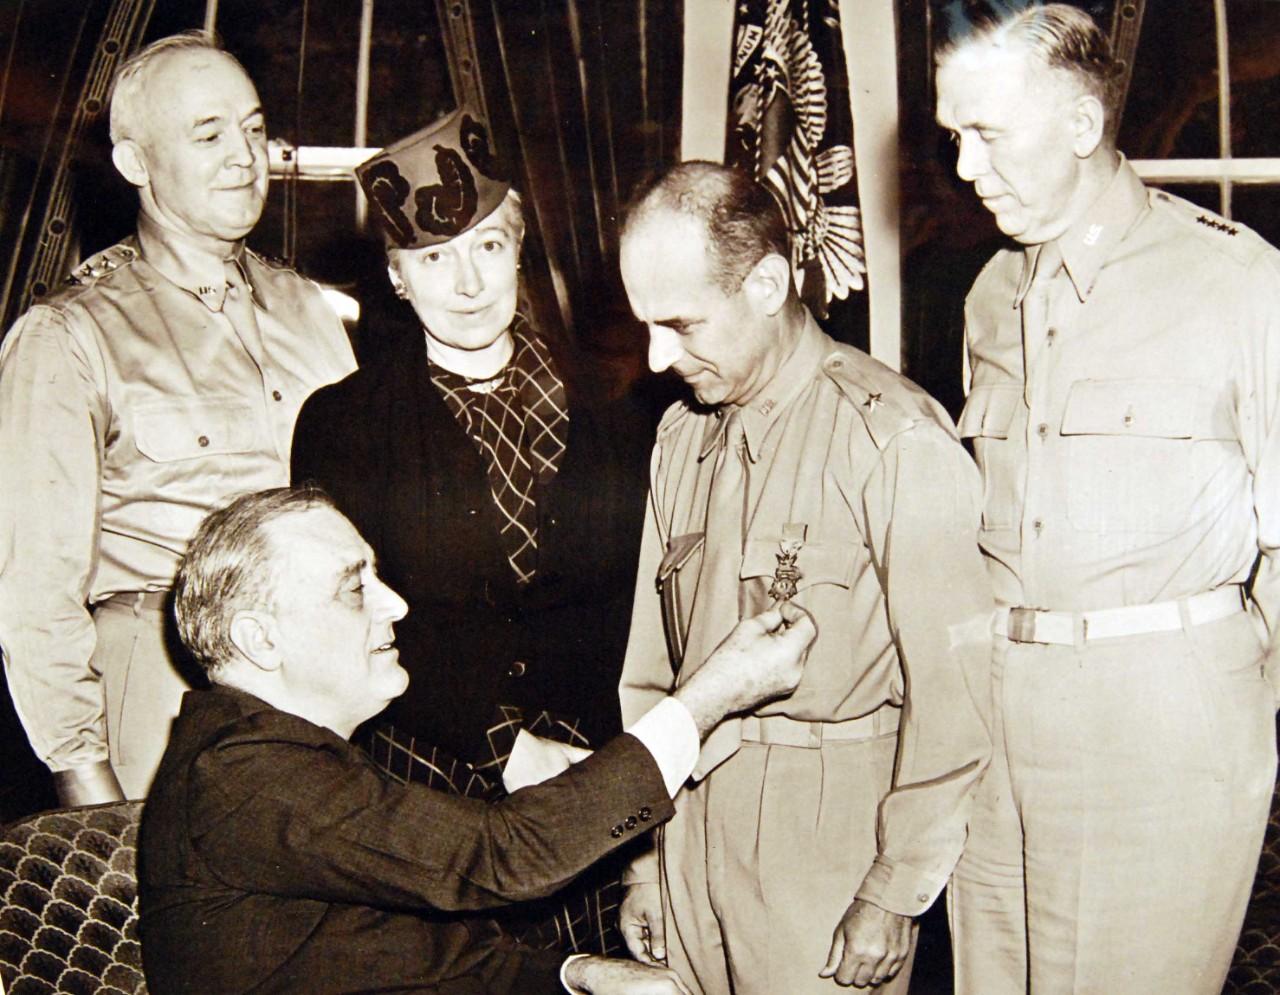 208-PU-52-LL-12: Brigadier General James H  Doolittle, USAAF